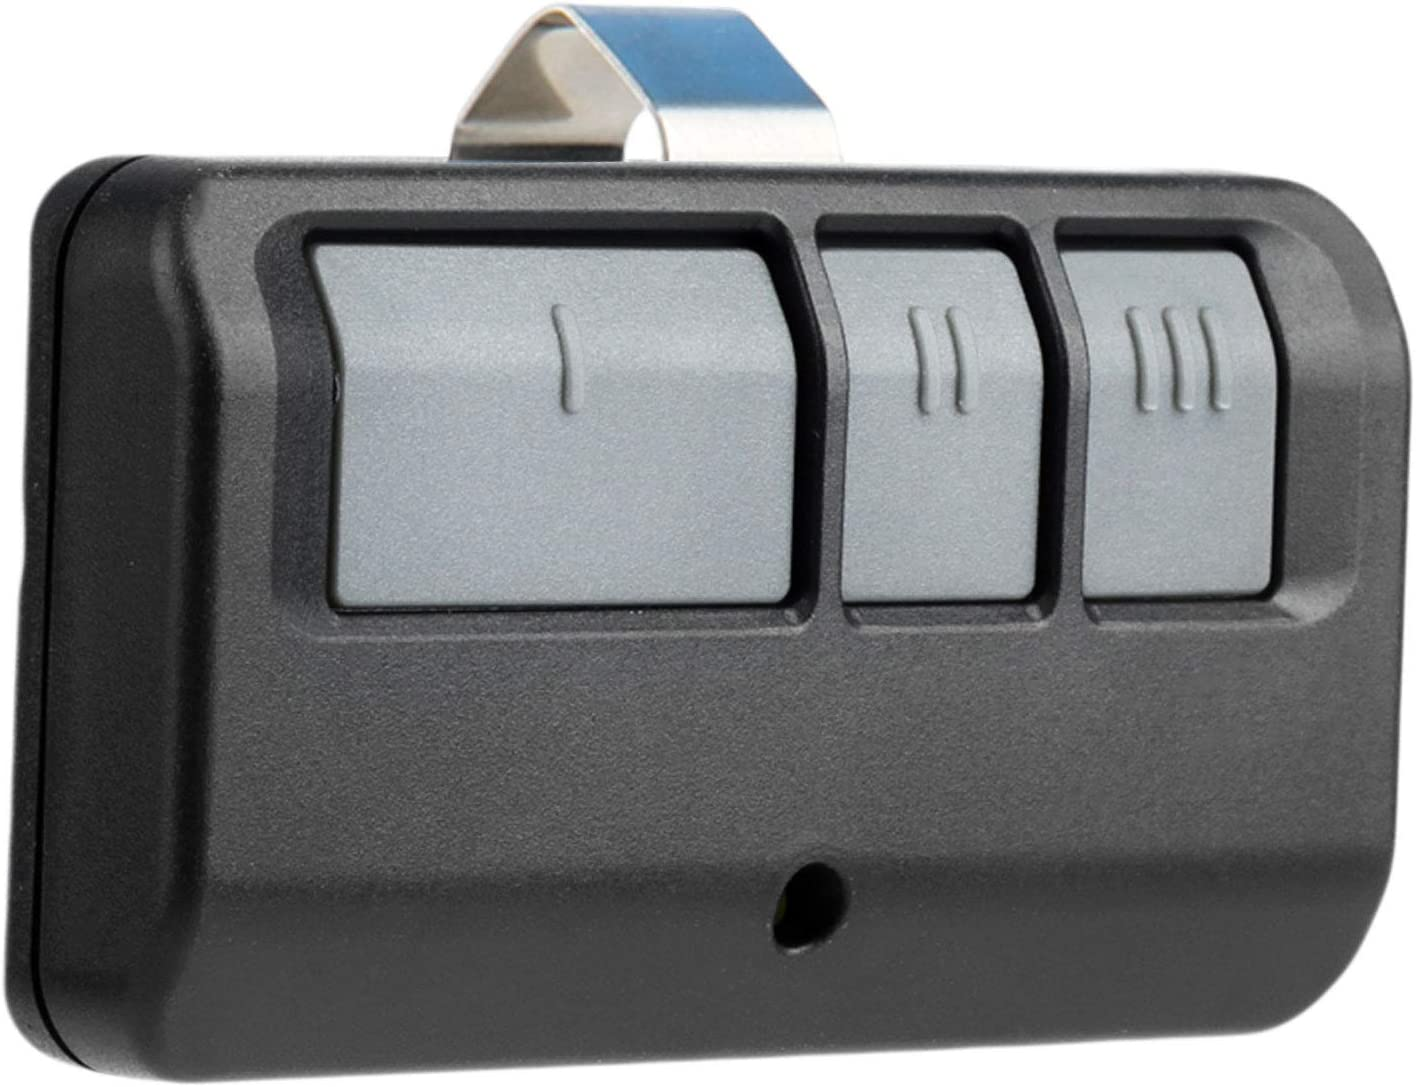 Garage Door Remote for Sears//Craftsman//Liftmaster Opener Purple Learn